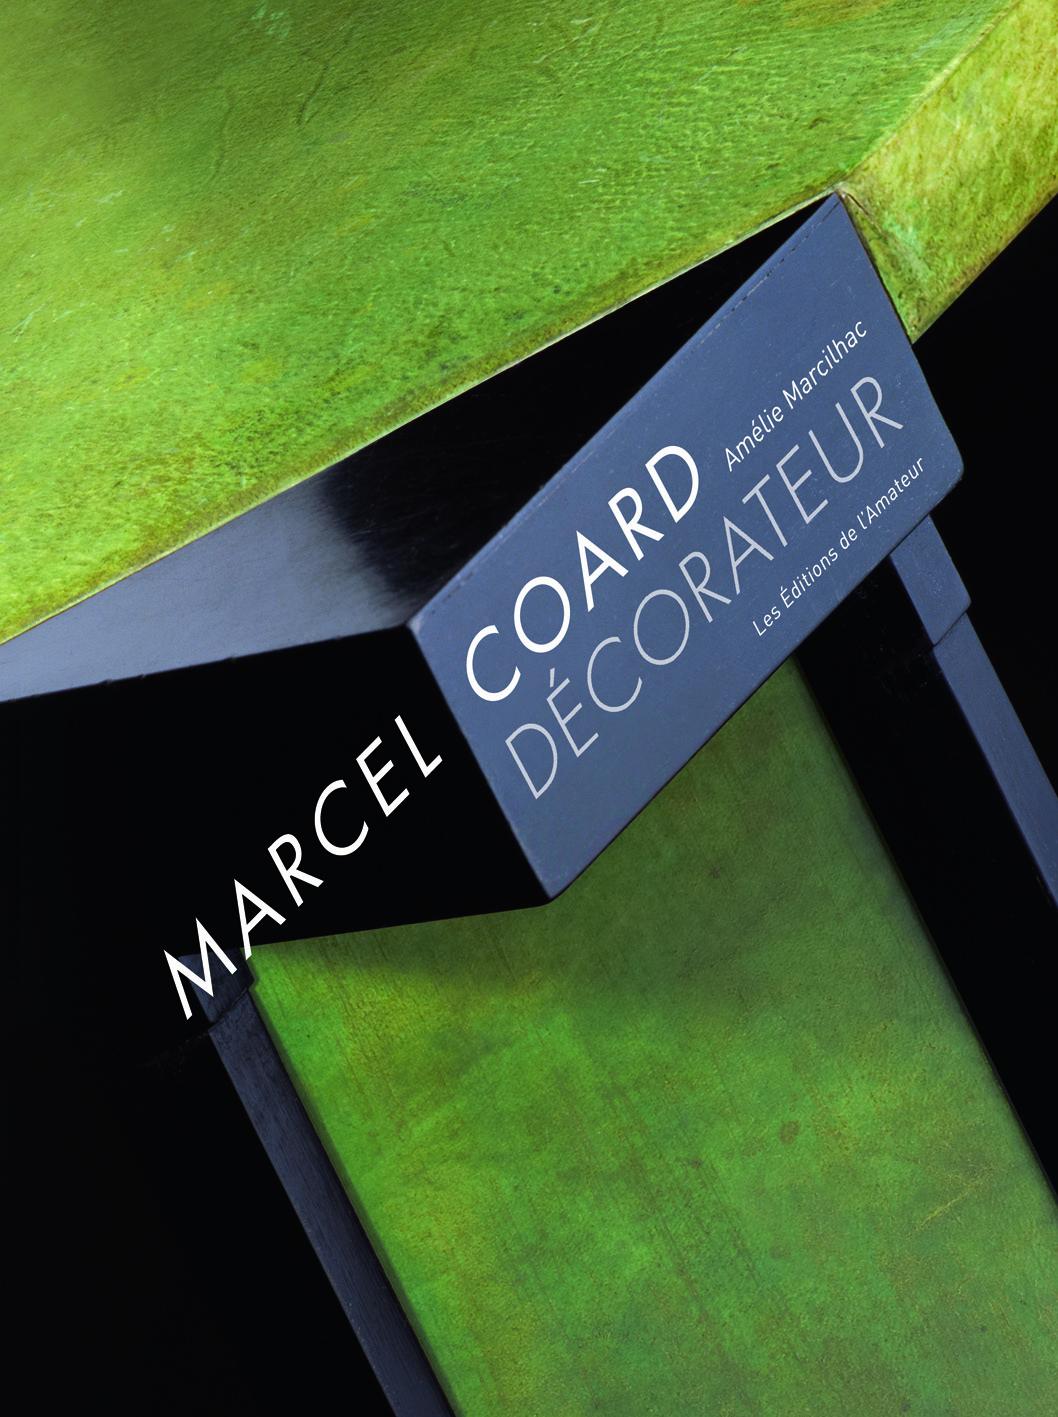 MARCEL COARD DECORATEUR